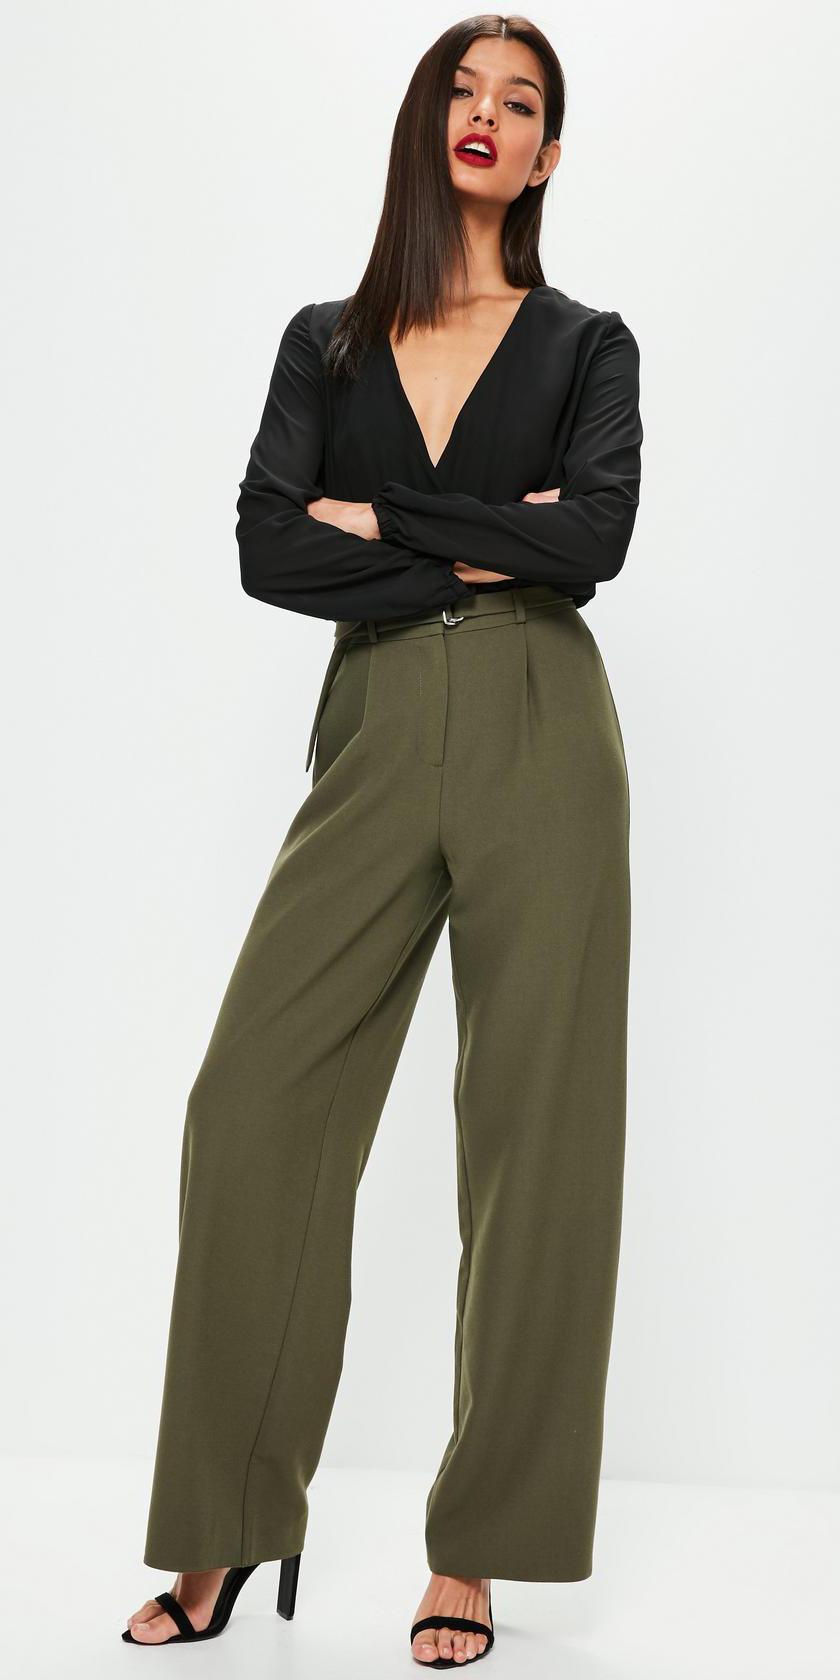 c019ce7216a7b6 green-olive-wideleg-pants-black-top-blouse-black-